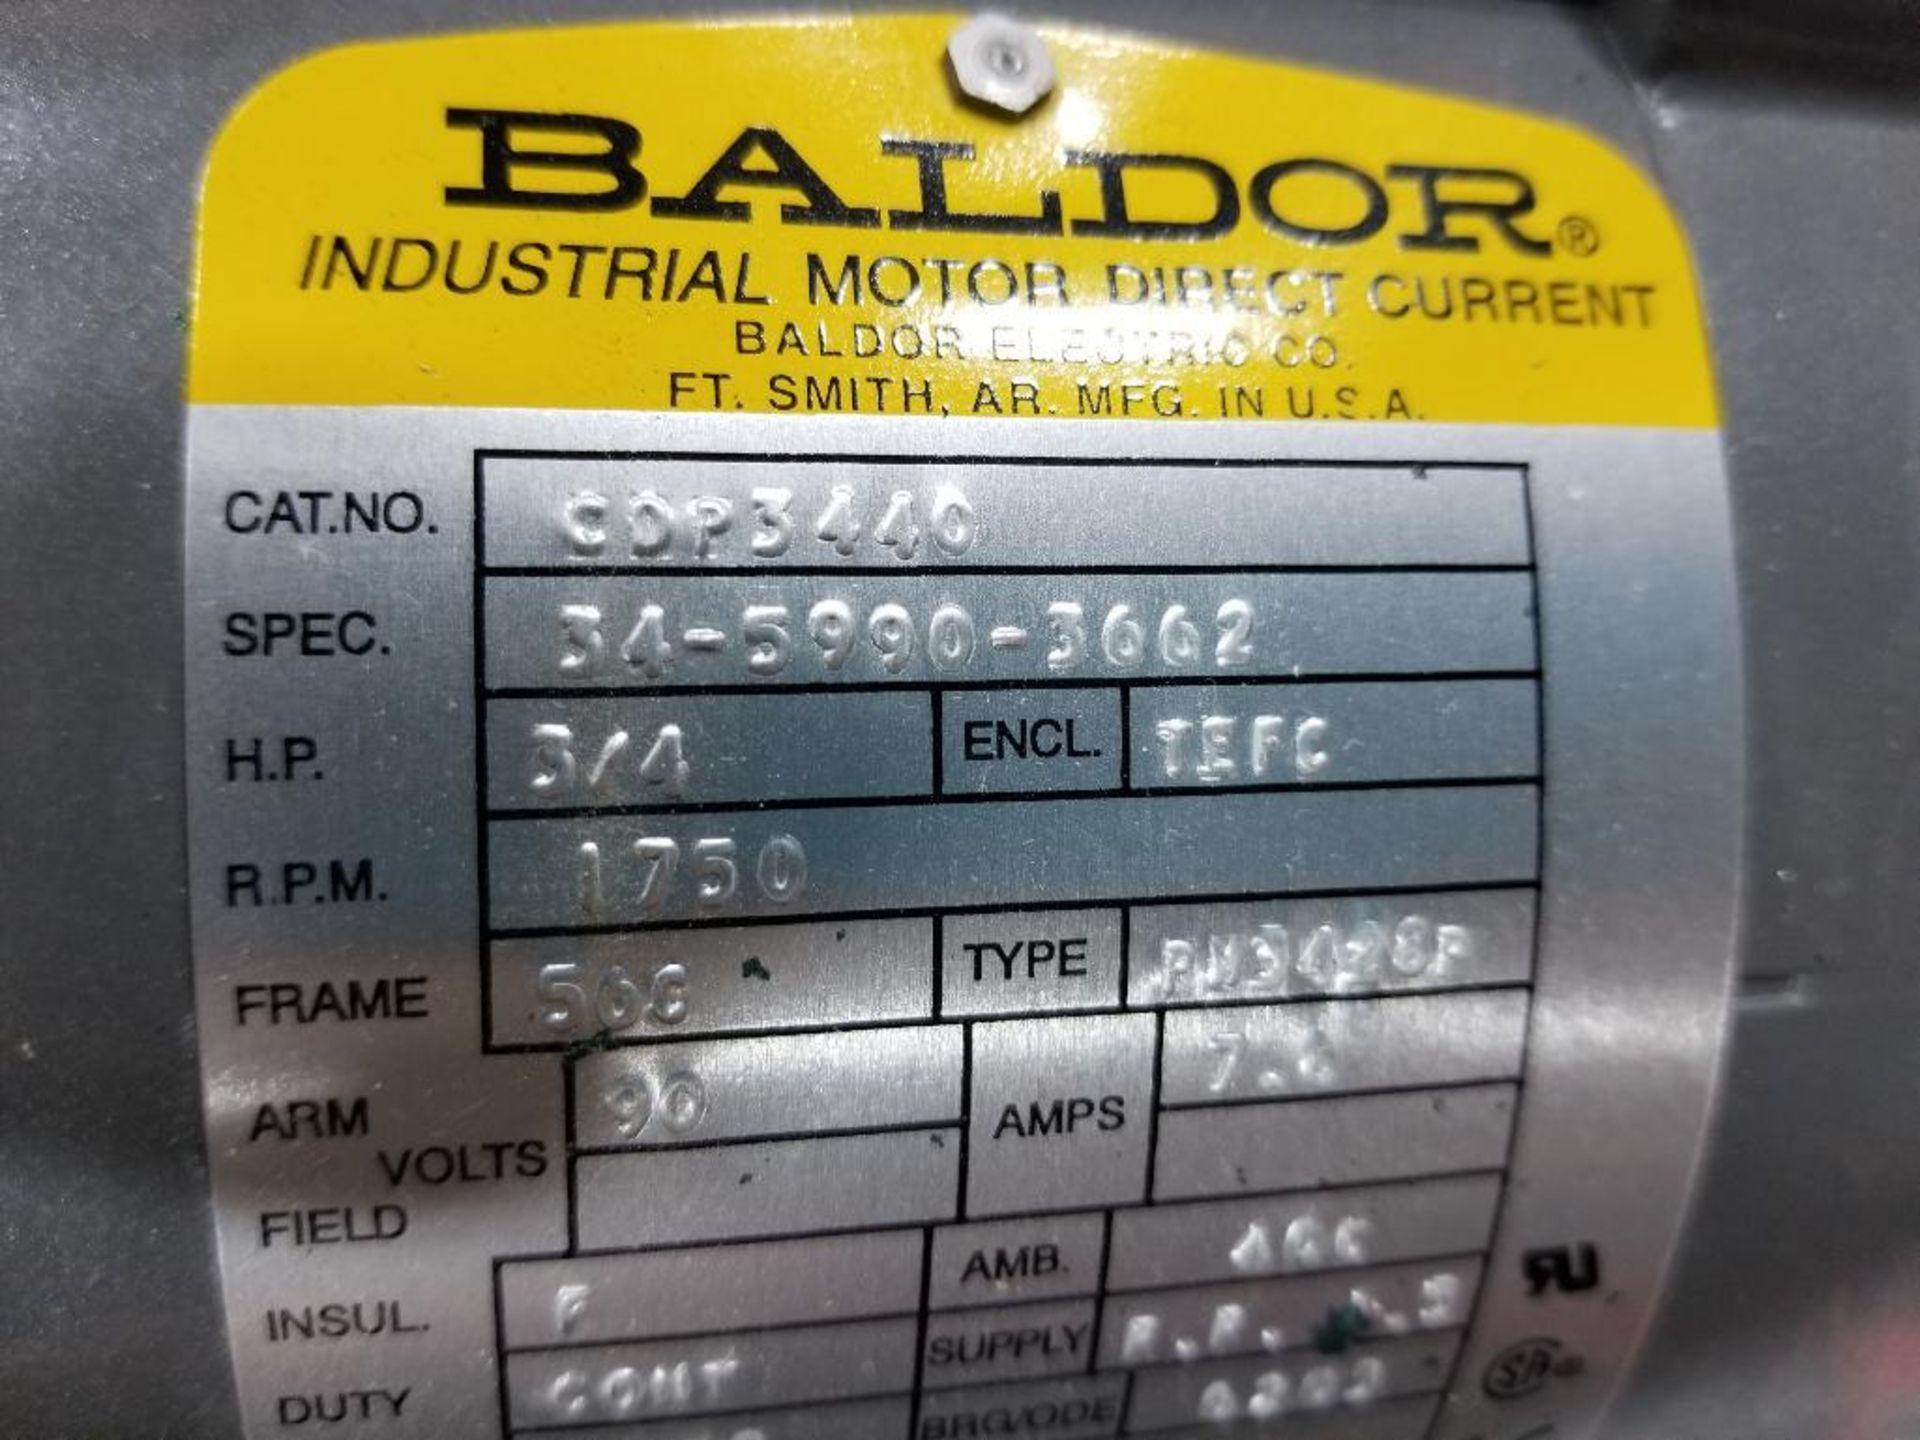 3/4HP Baldor industrial motor COP3440, 34-5990-3662. 1750RPM, 56C-Frame. - Image 2 of 5